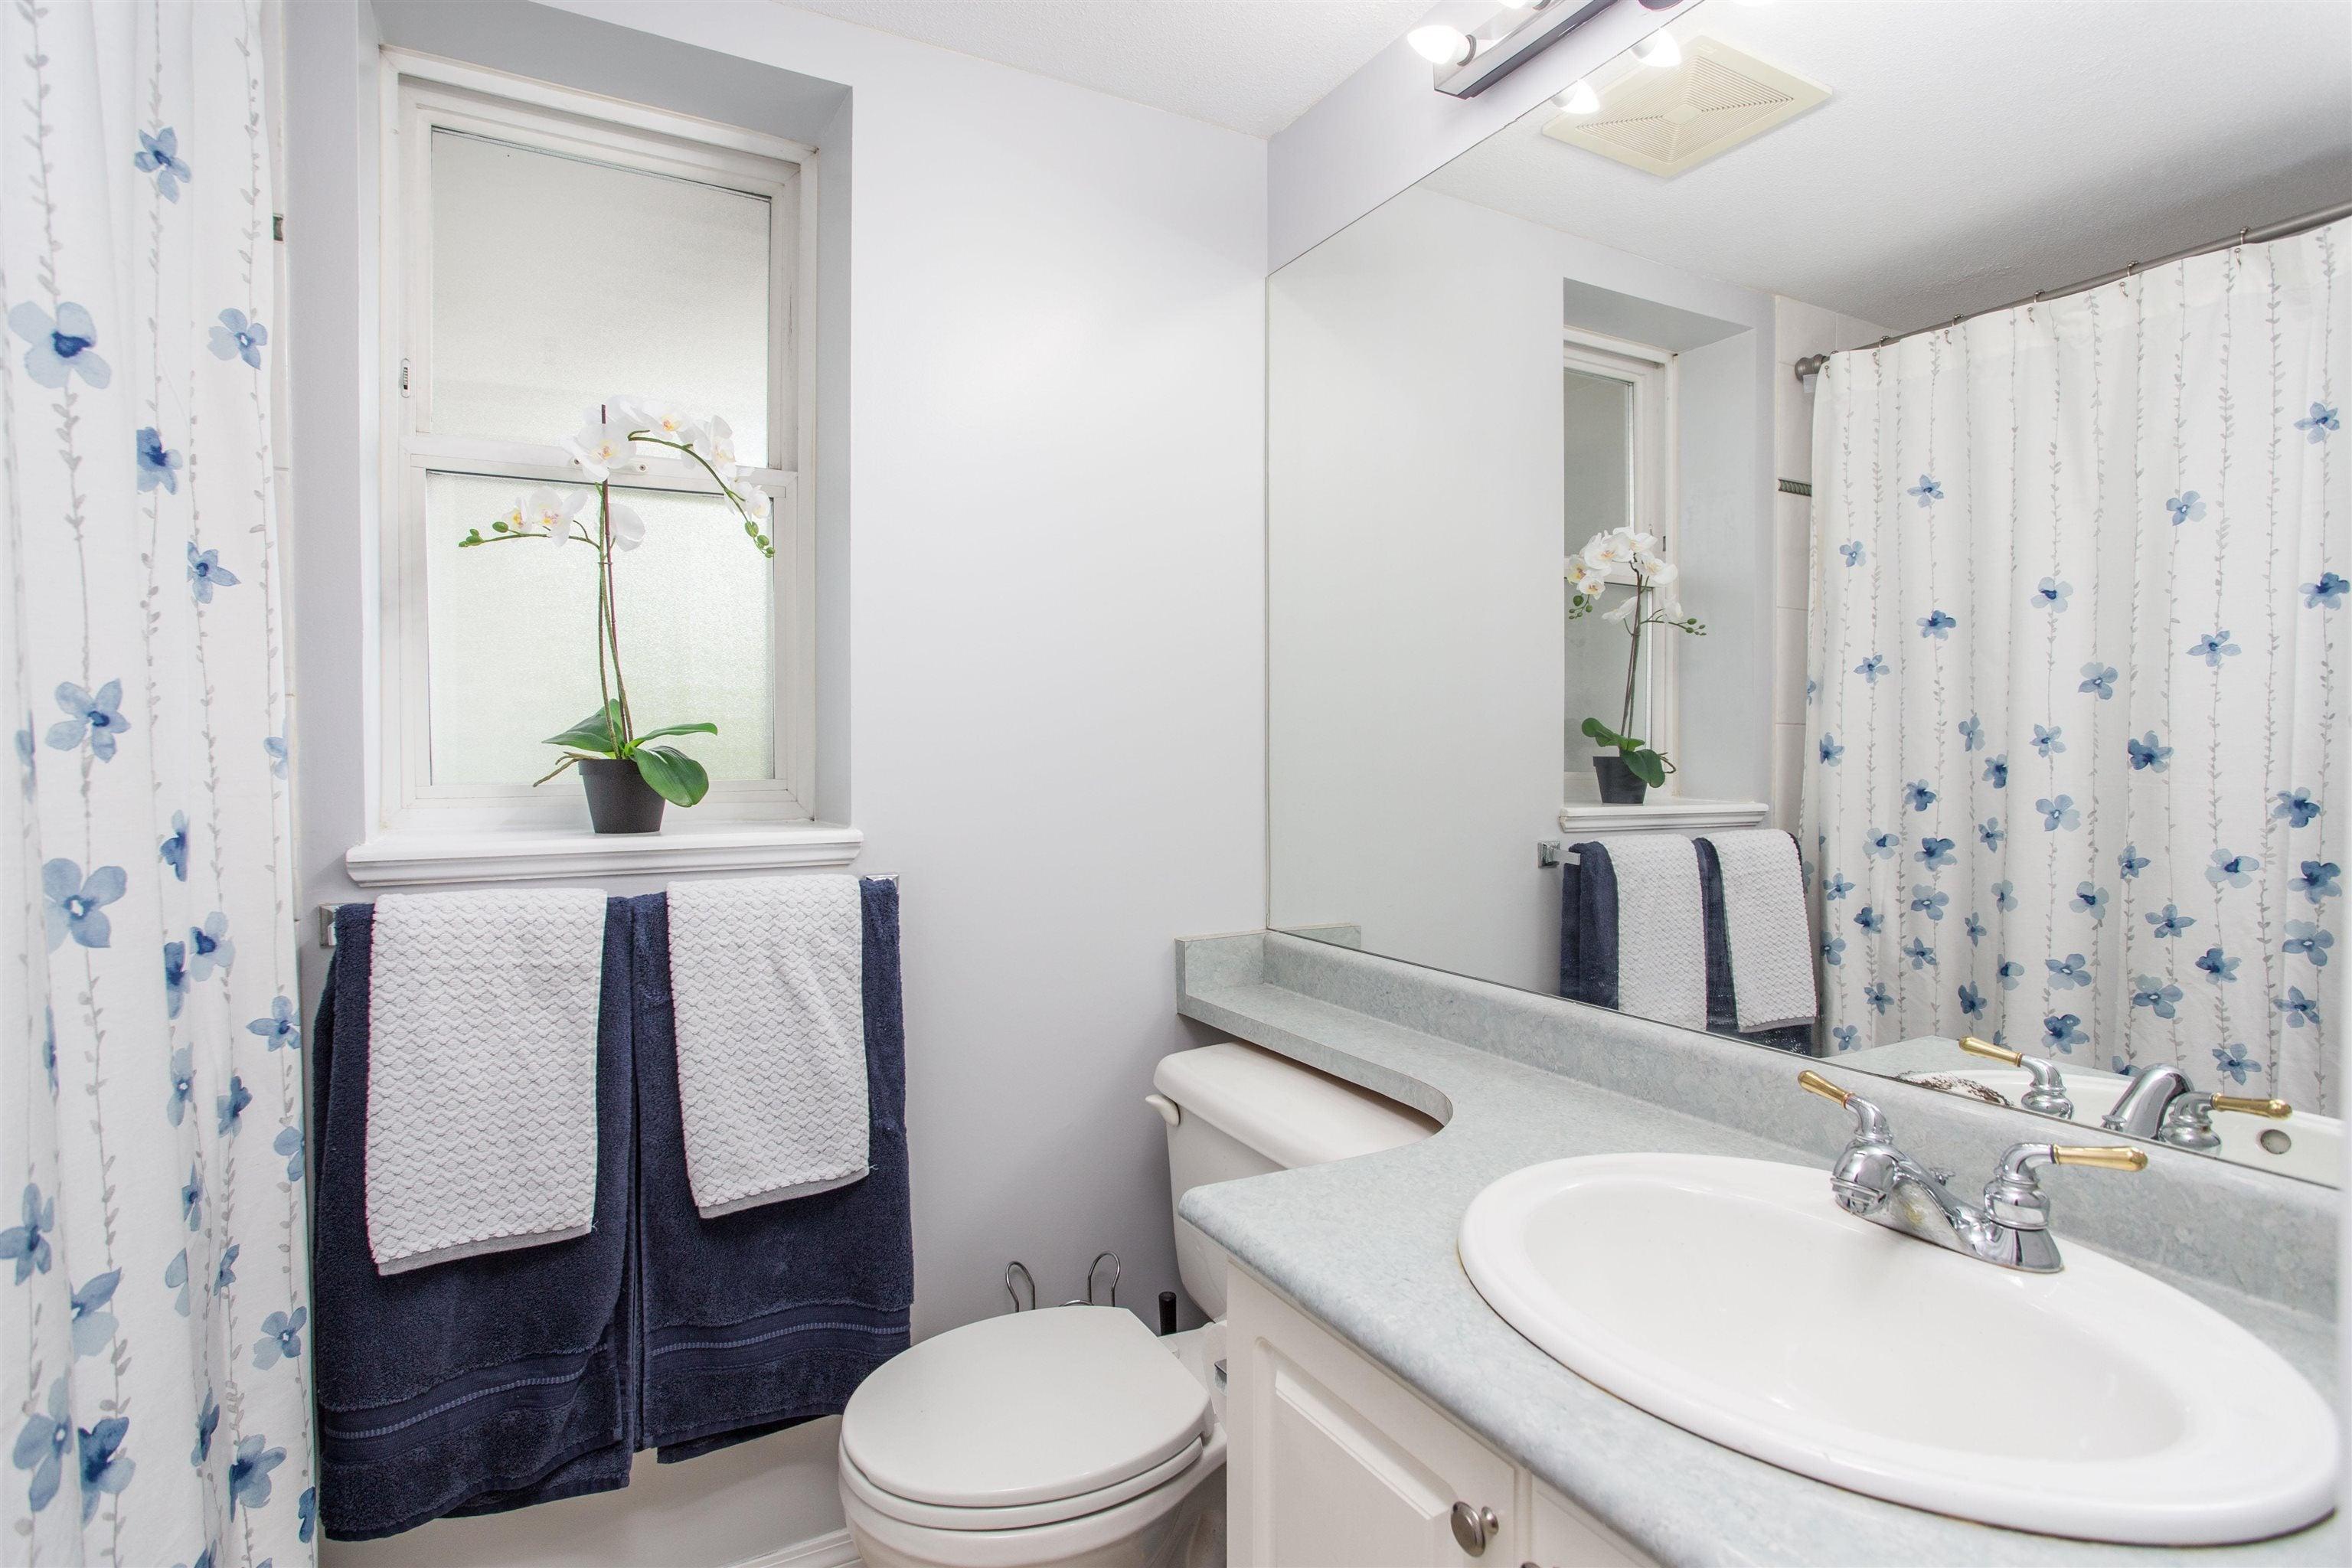 7 205 LEBLEU STREET - Maillardville Apartment/Condo for sale, 3 Bedrooms (R2625671) - #15